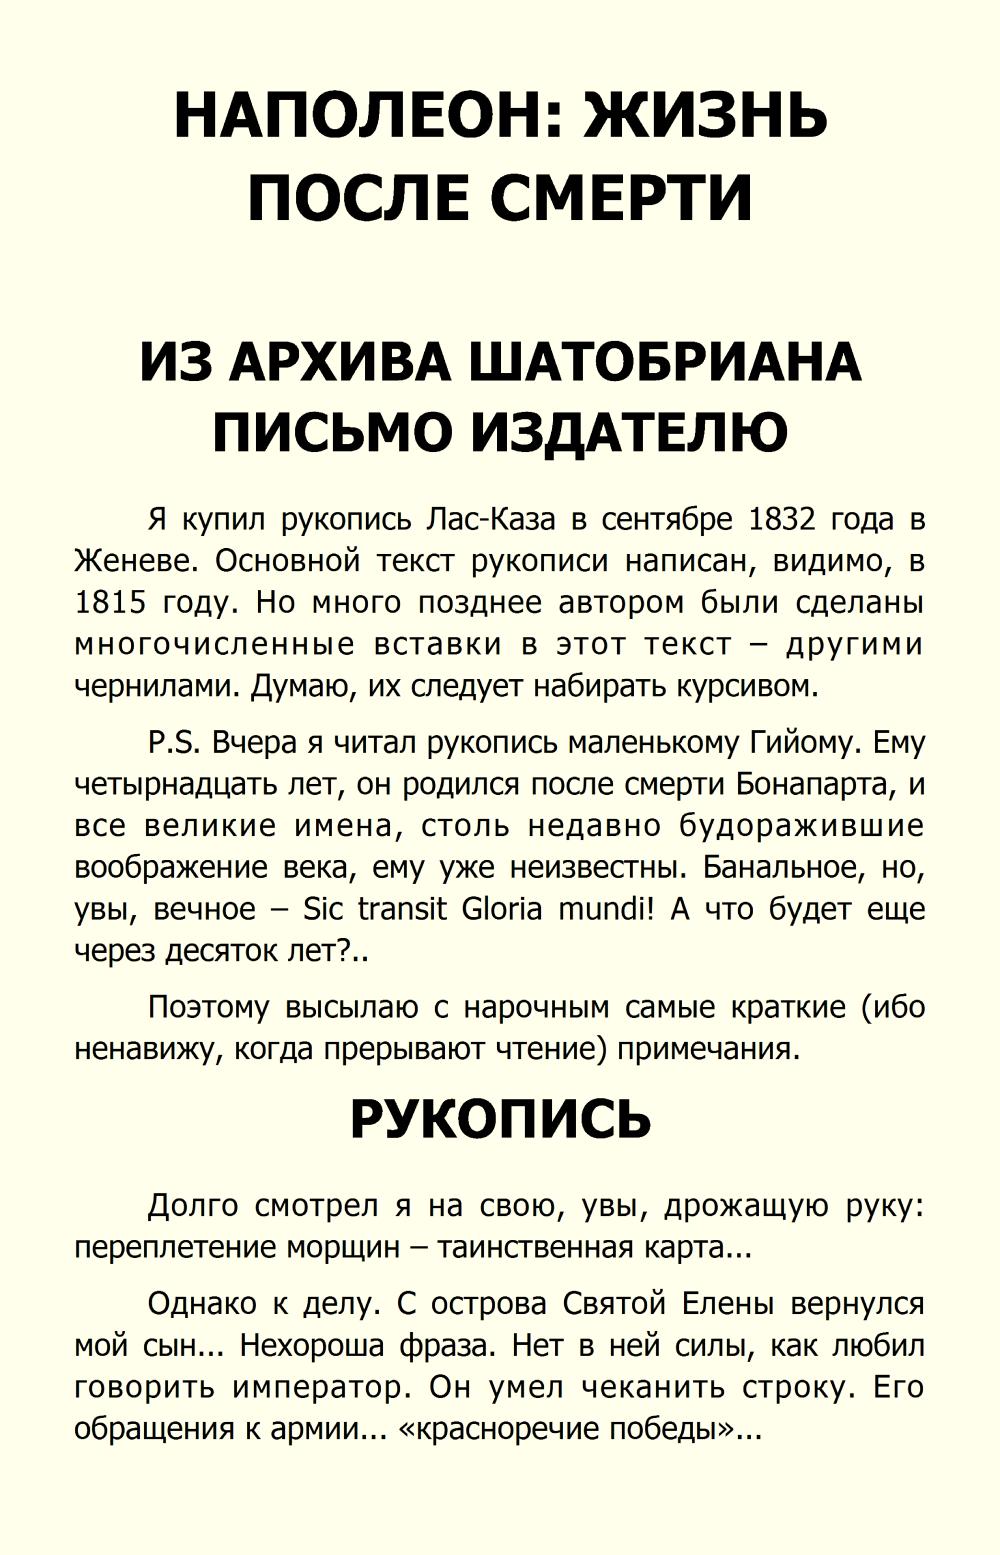 http://i6.imageban.ru/out/2013/11/10/a5dcb39924bf9395d12c9aee0e302937.jpg